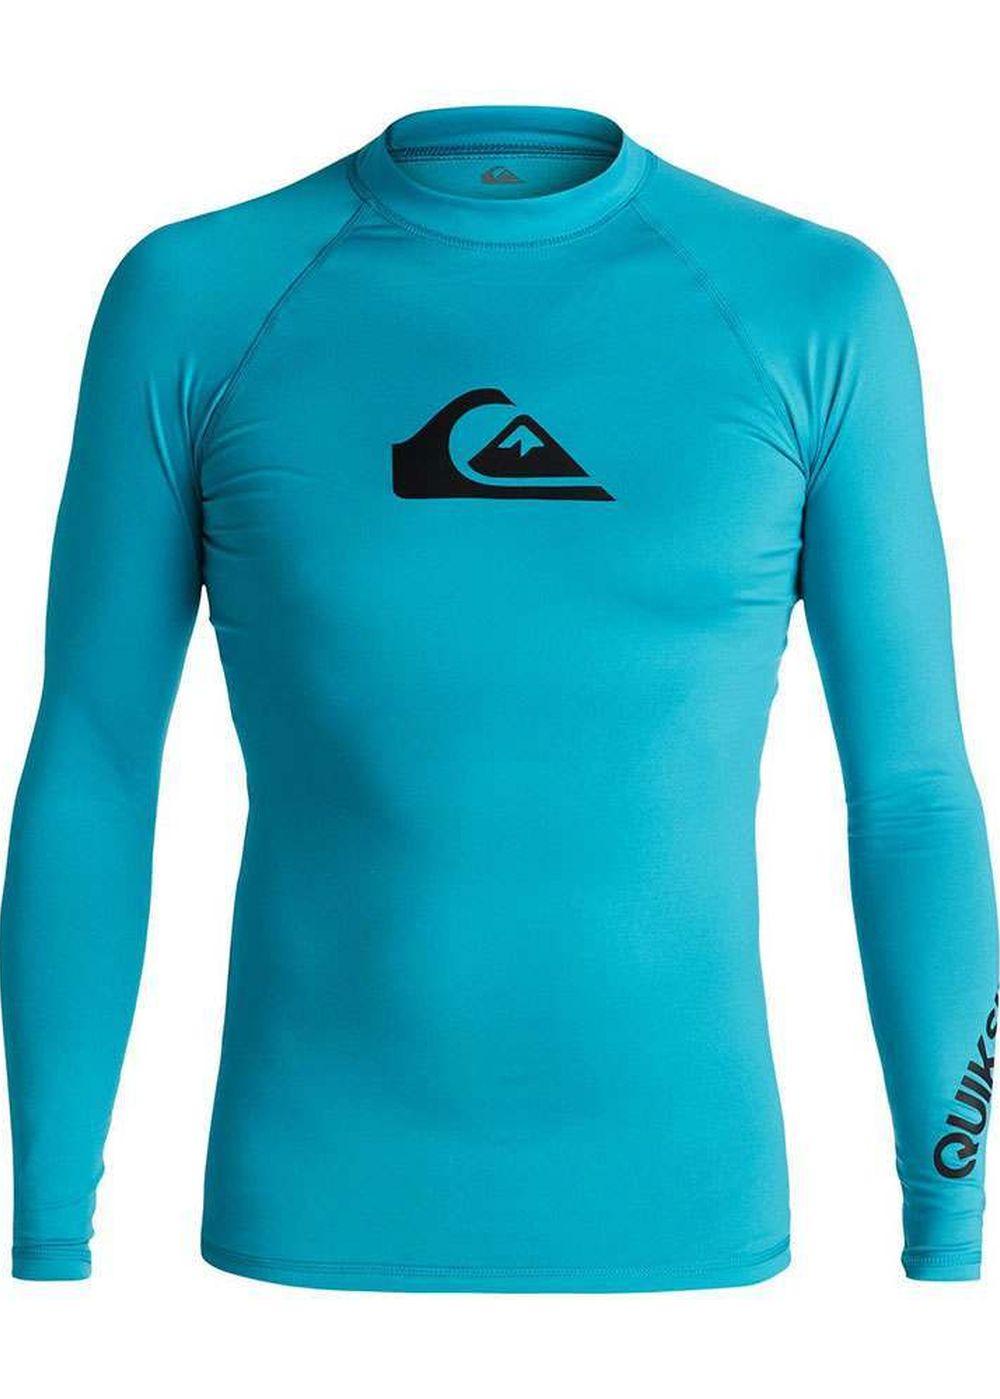 Quiksilver All Time Long Sleeve Rash Vest Blue Picture